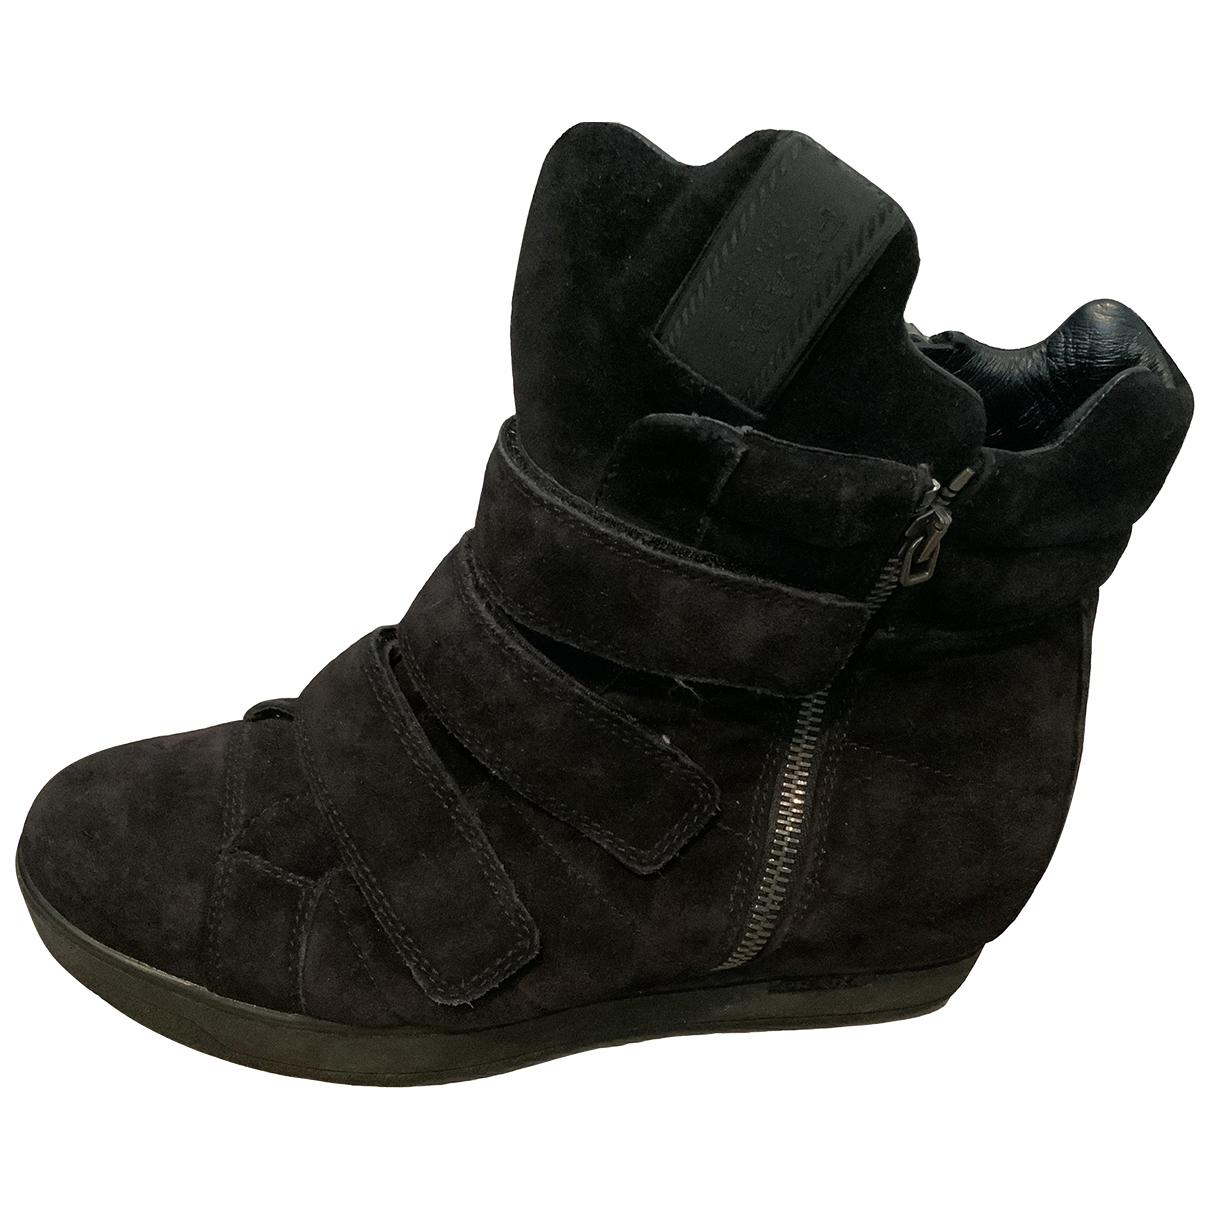 Prada \N Black Suede Boots for Women 39 EU